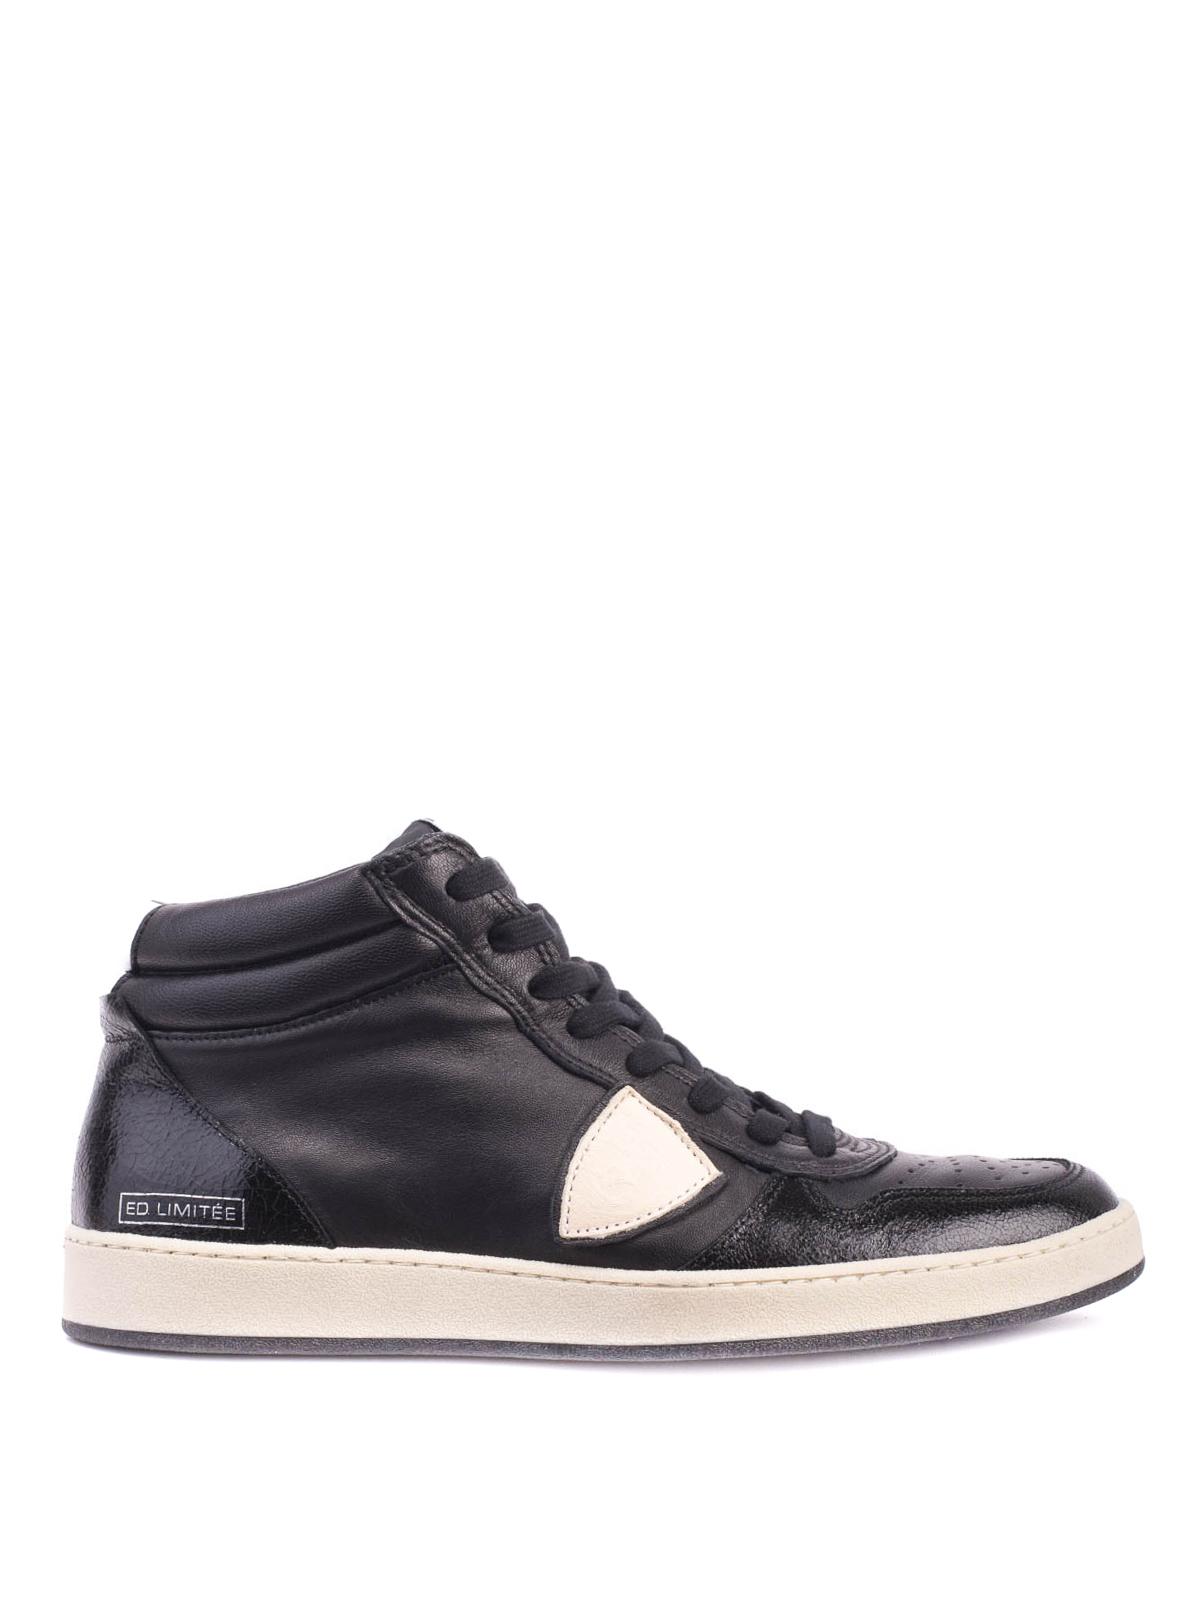 Lakers Philippe Alte Sneaker Model Sneakers Lkhuvl14 AL3q54Rj